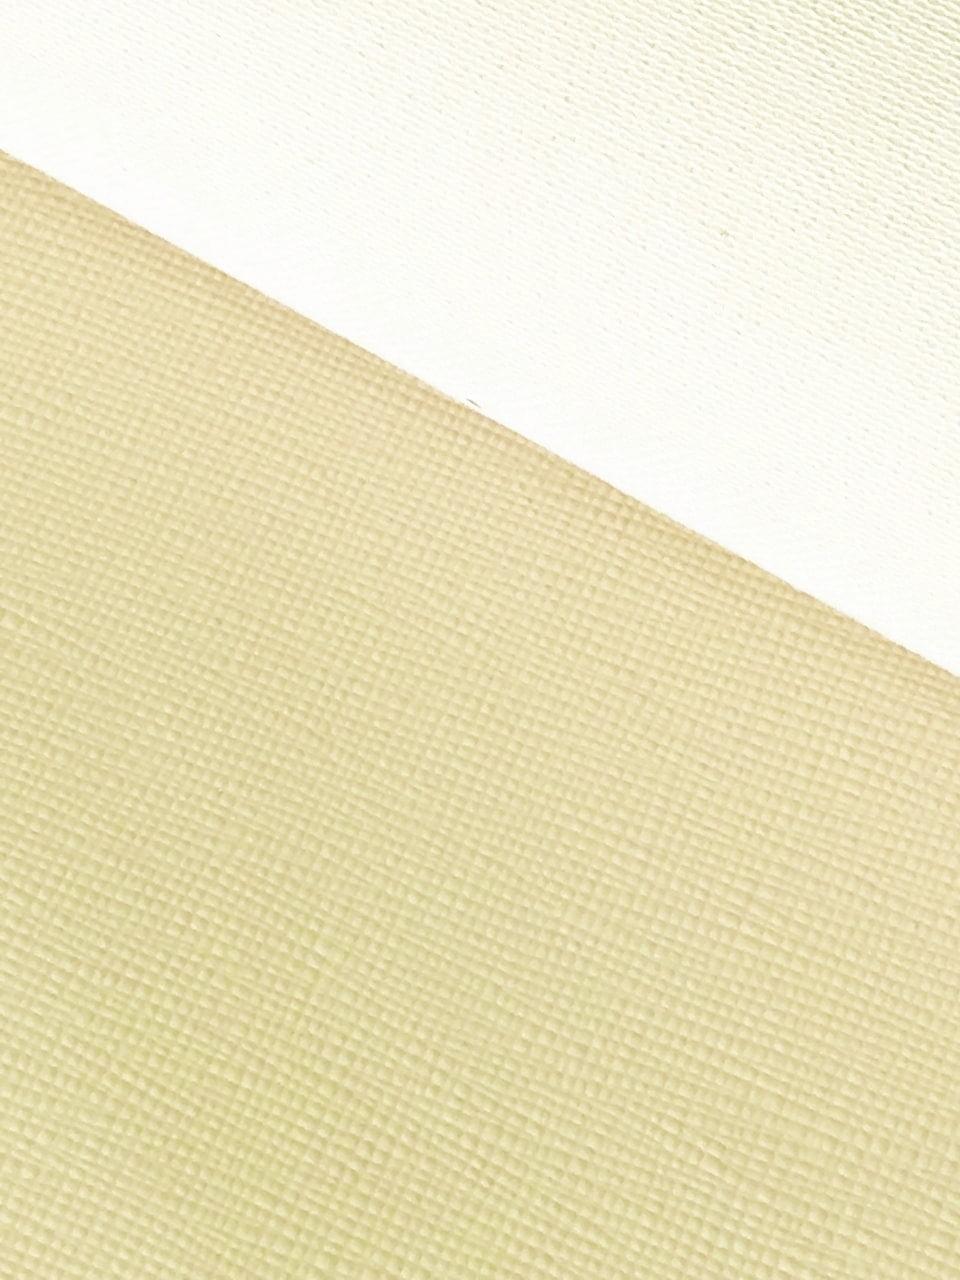 Sintético Rustic Marfim